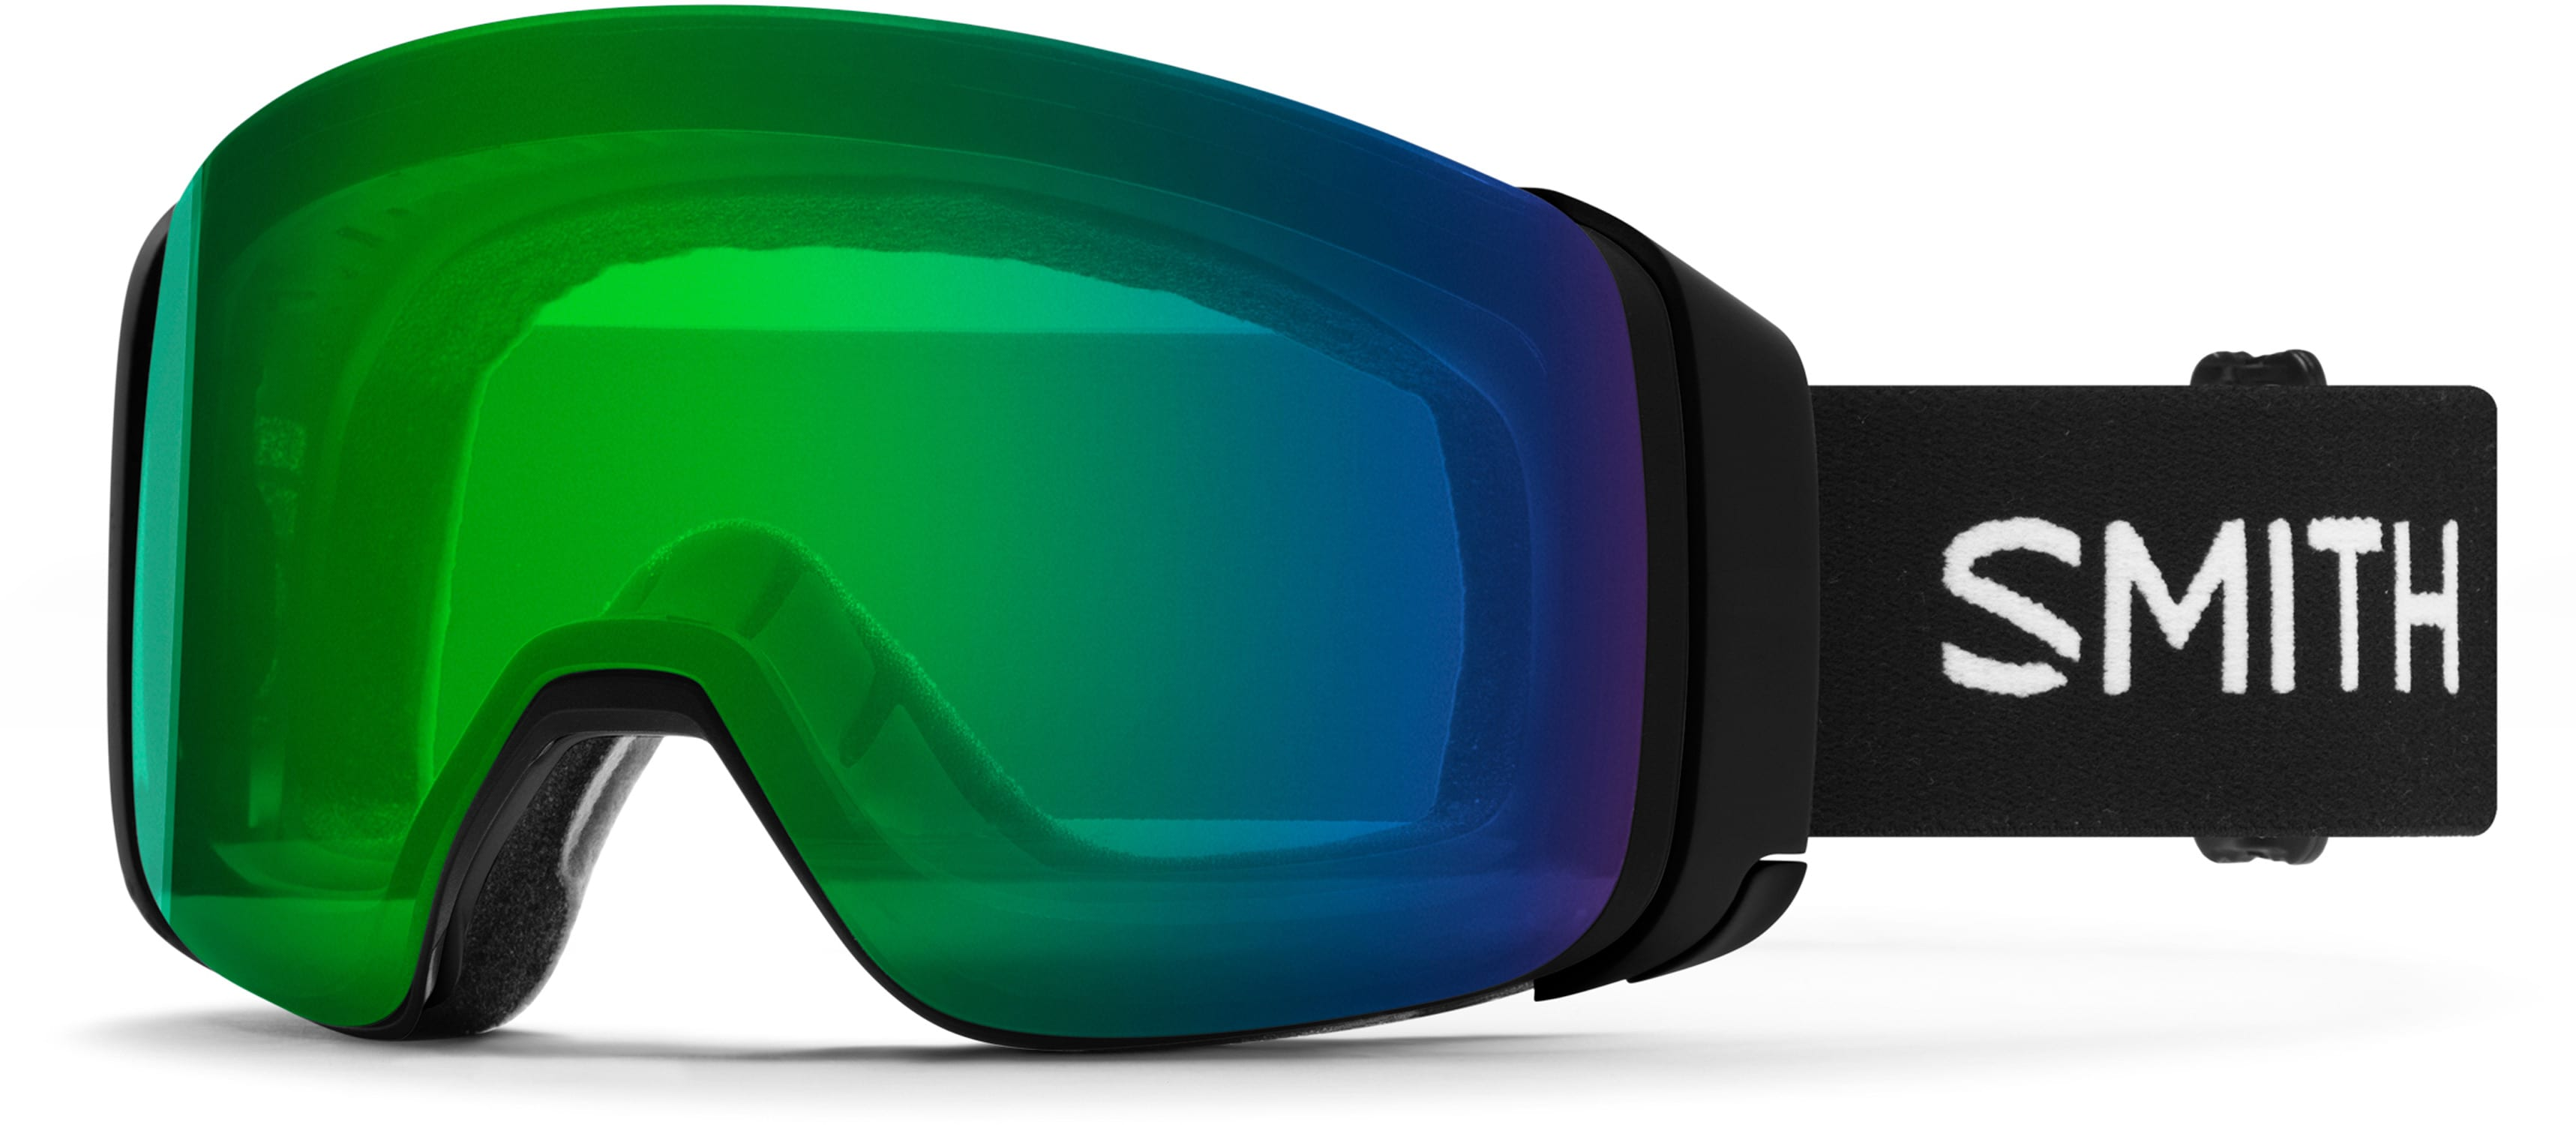 Smith 4D Mag w/ Bonus Lens Goggles 2020